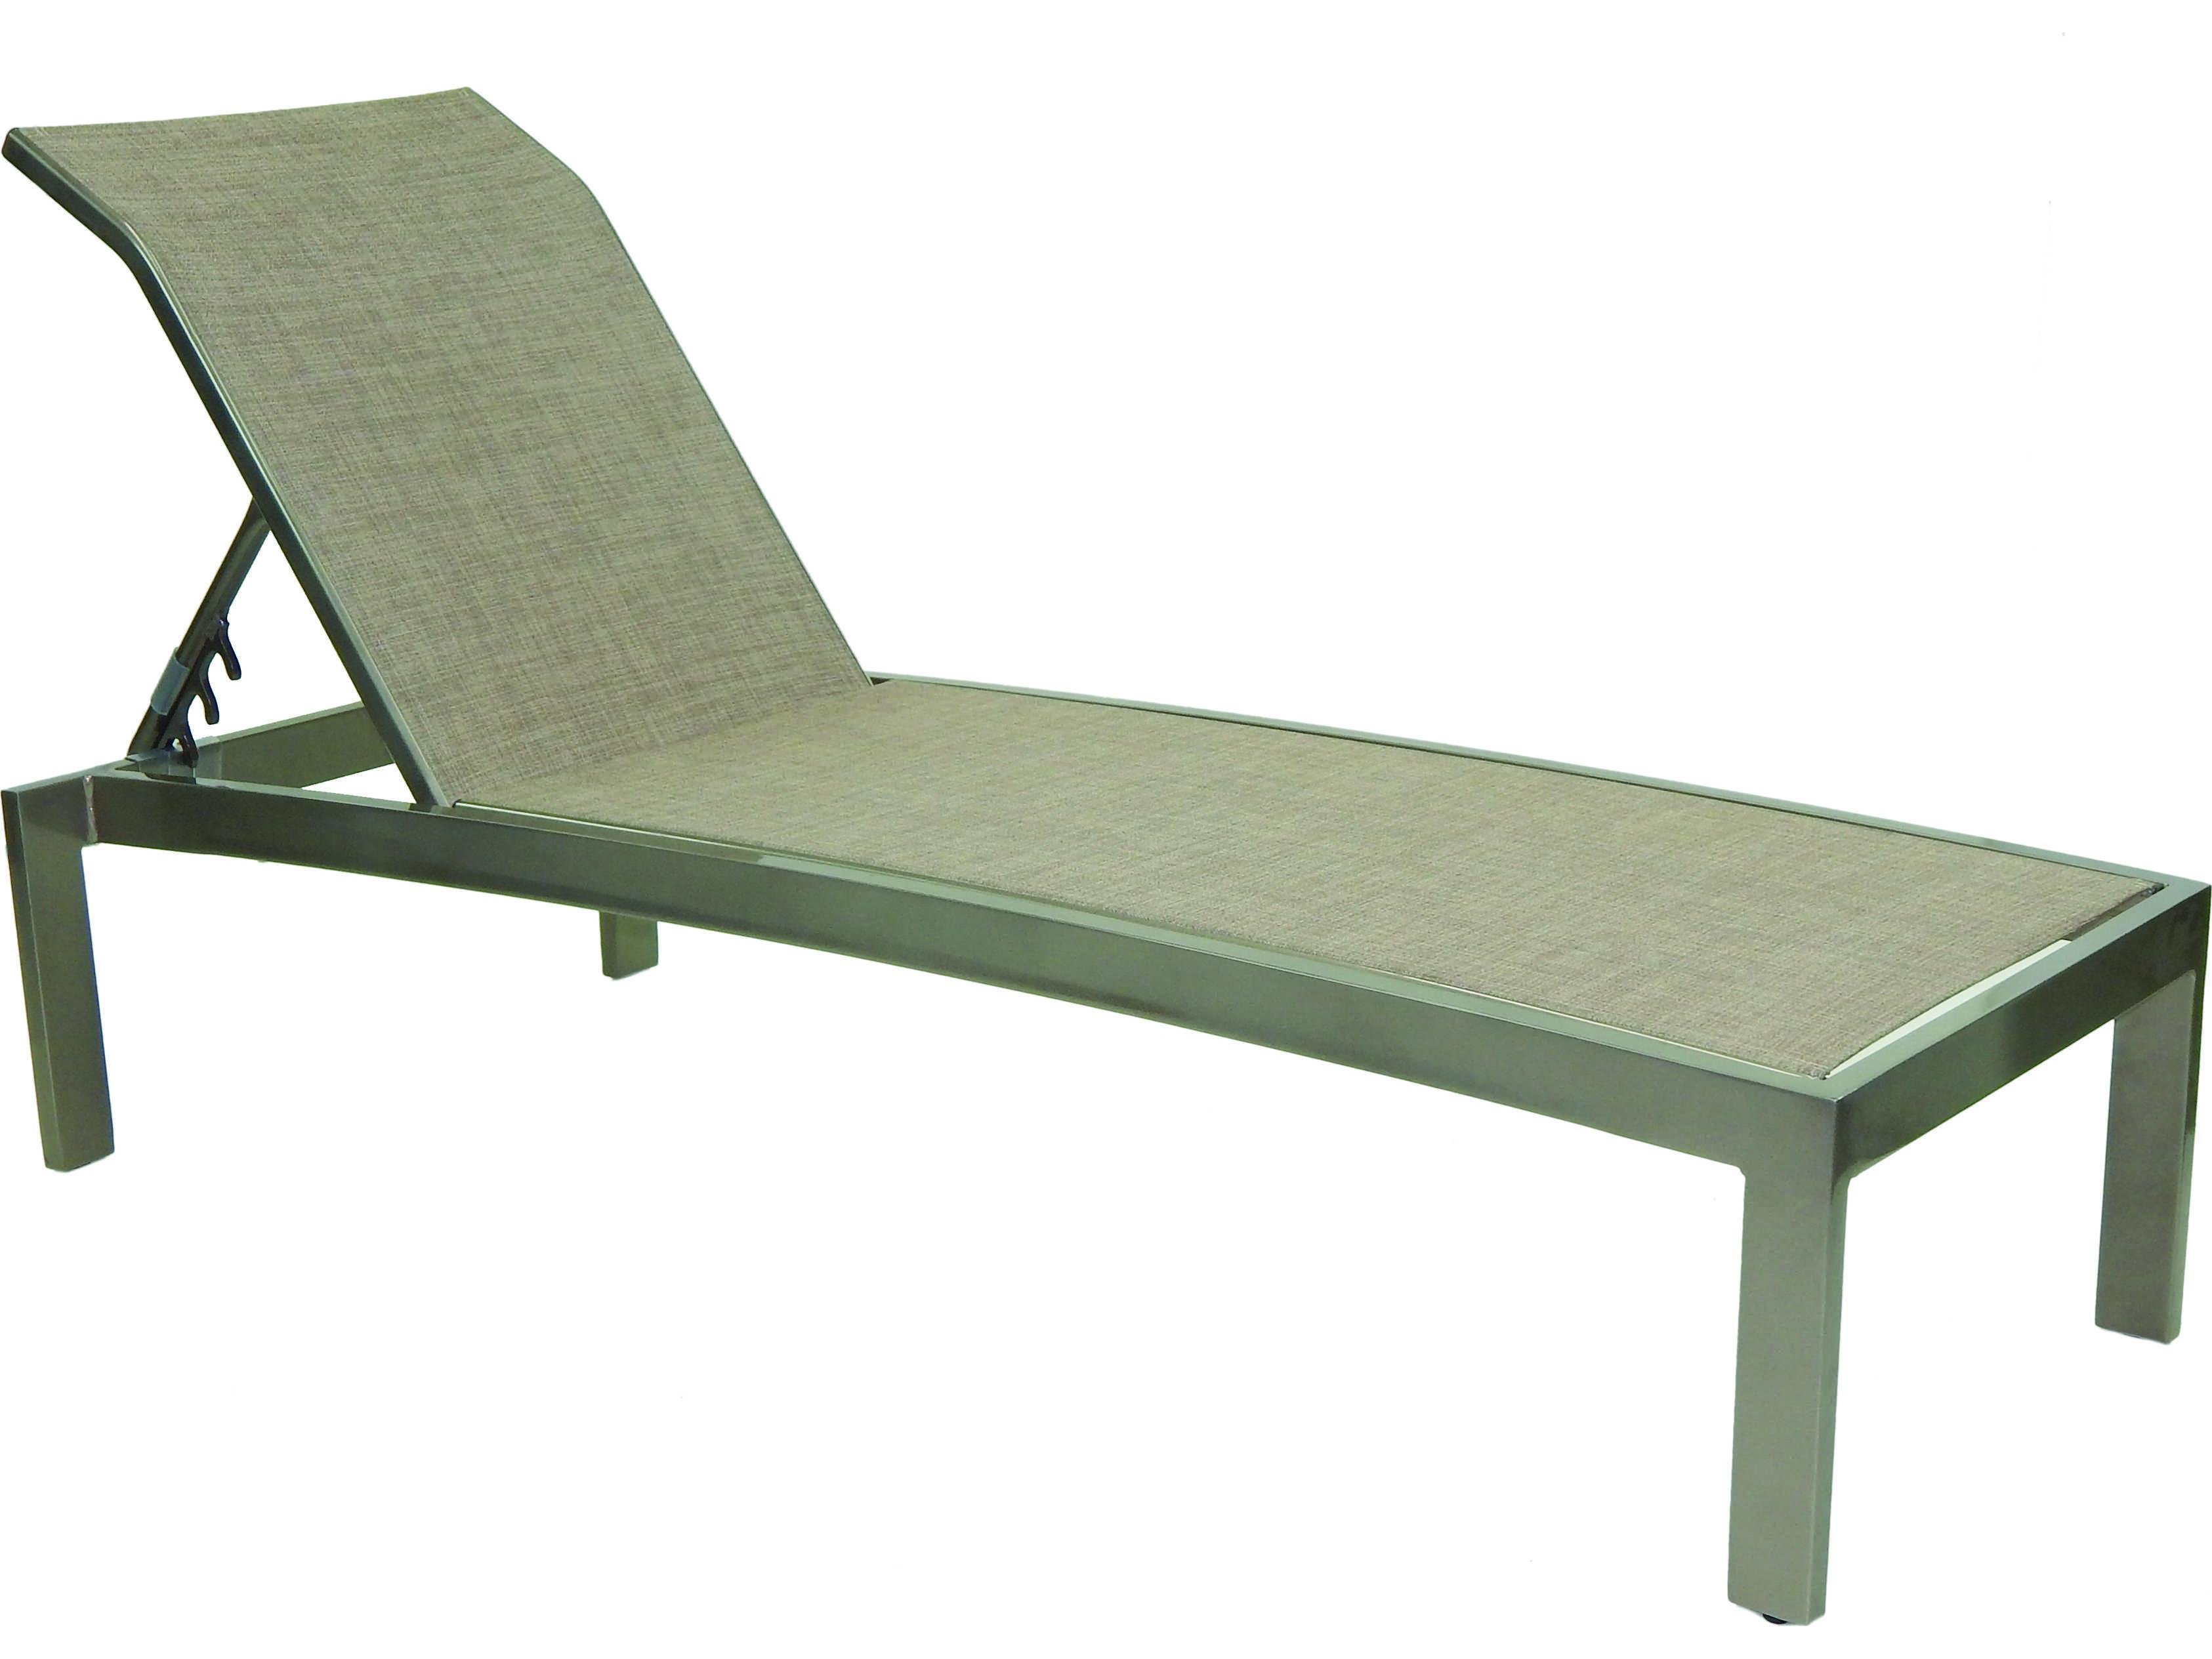 Castelle orion sling cast aluminum adjustable chaise for Cast aluminum outdoor chaise lounge